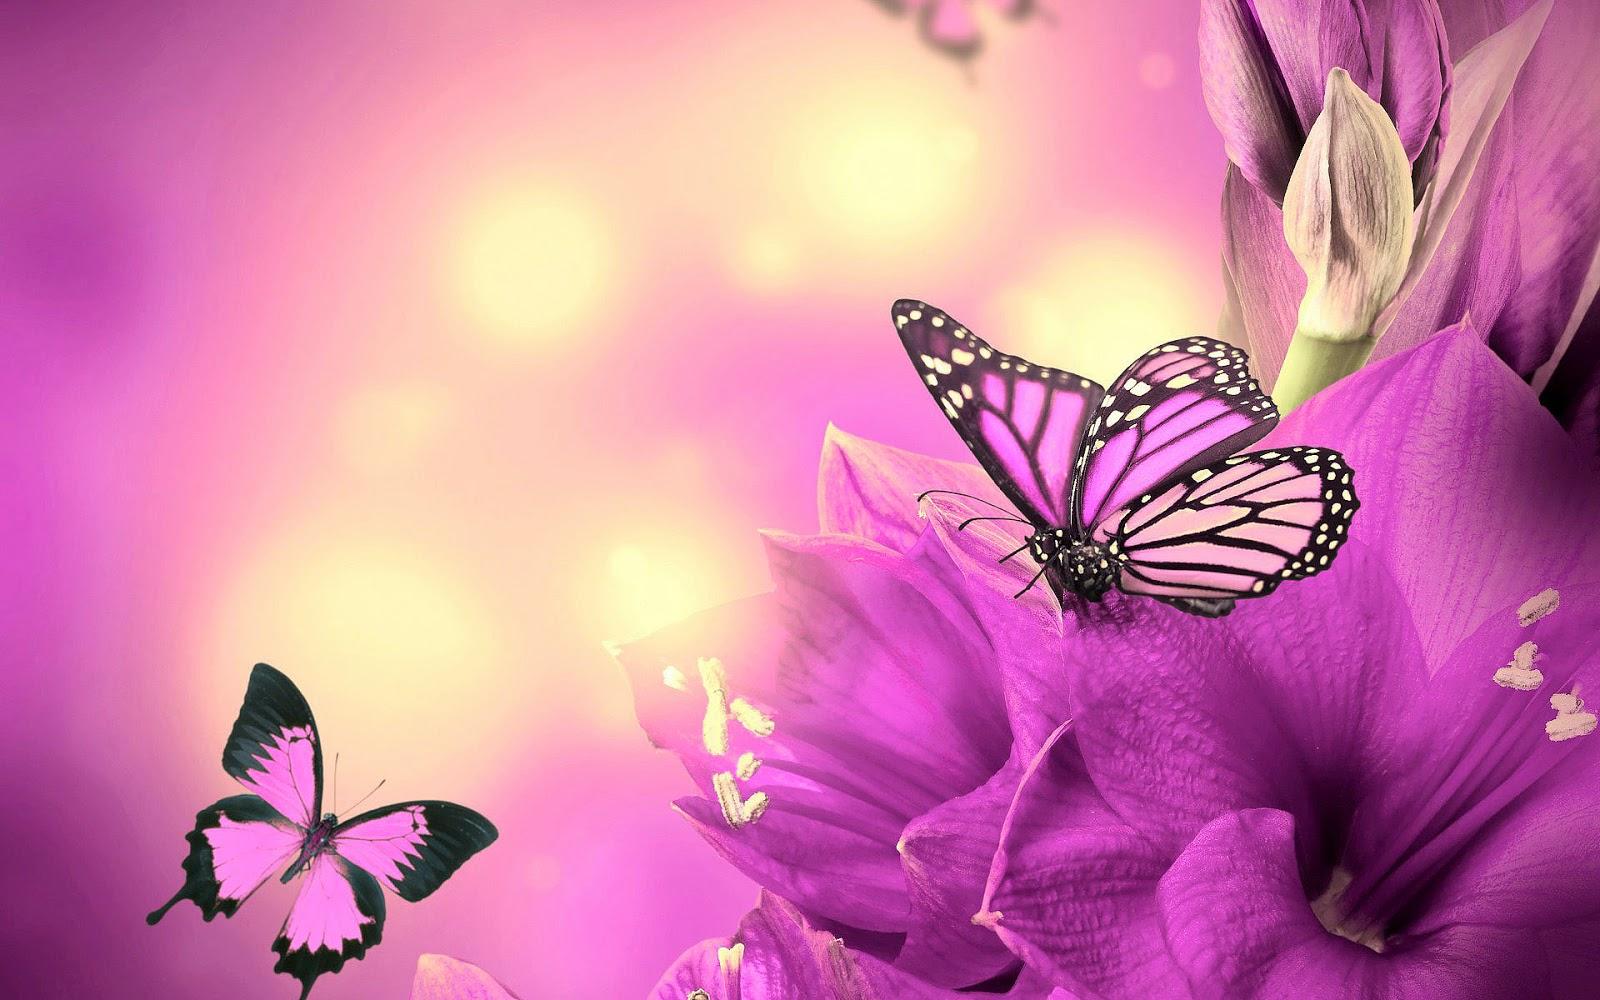 Roze vlinders en roze bloemen in de lente